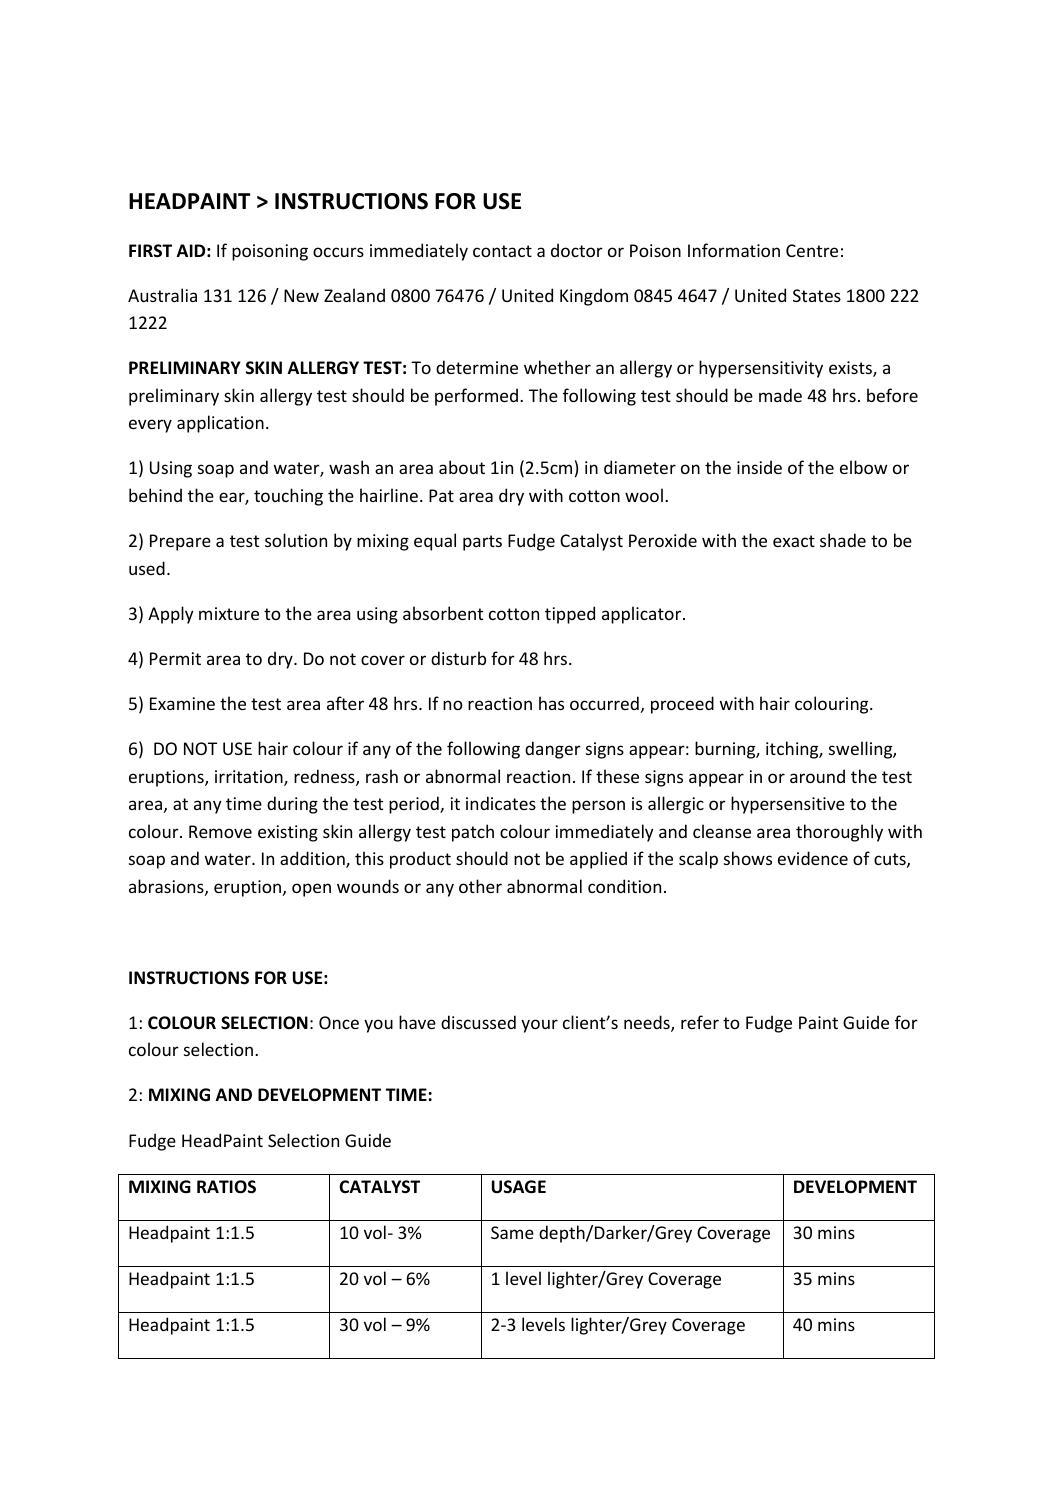 Fudge Headpaint Instruction Leaflet By Fudge Hair Issuu